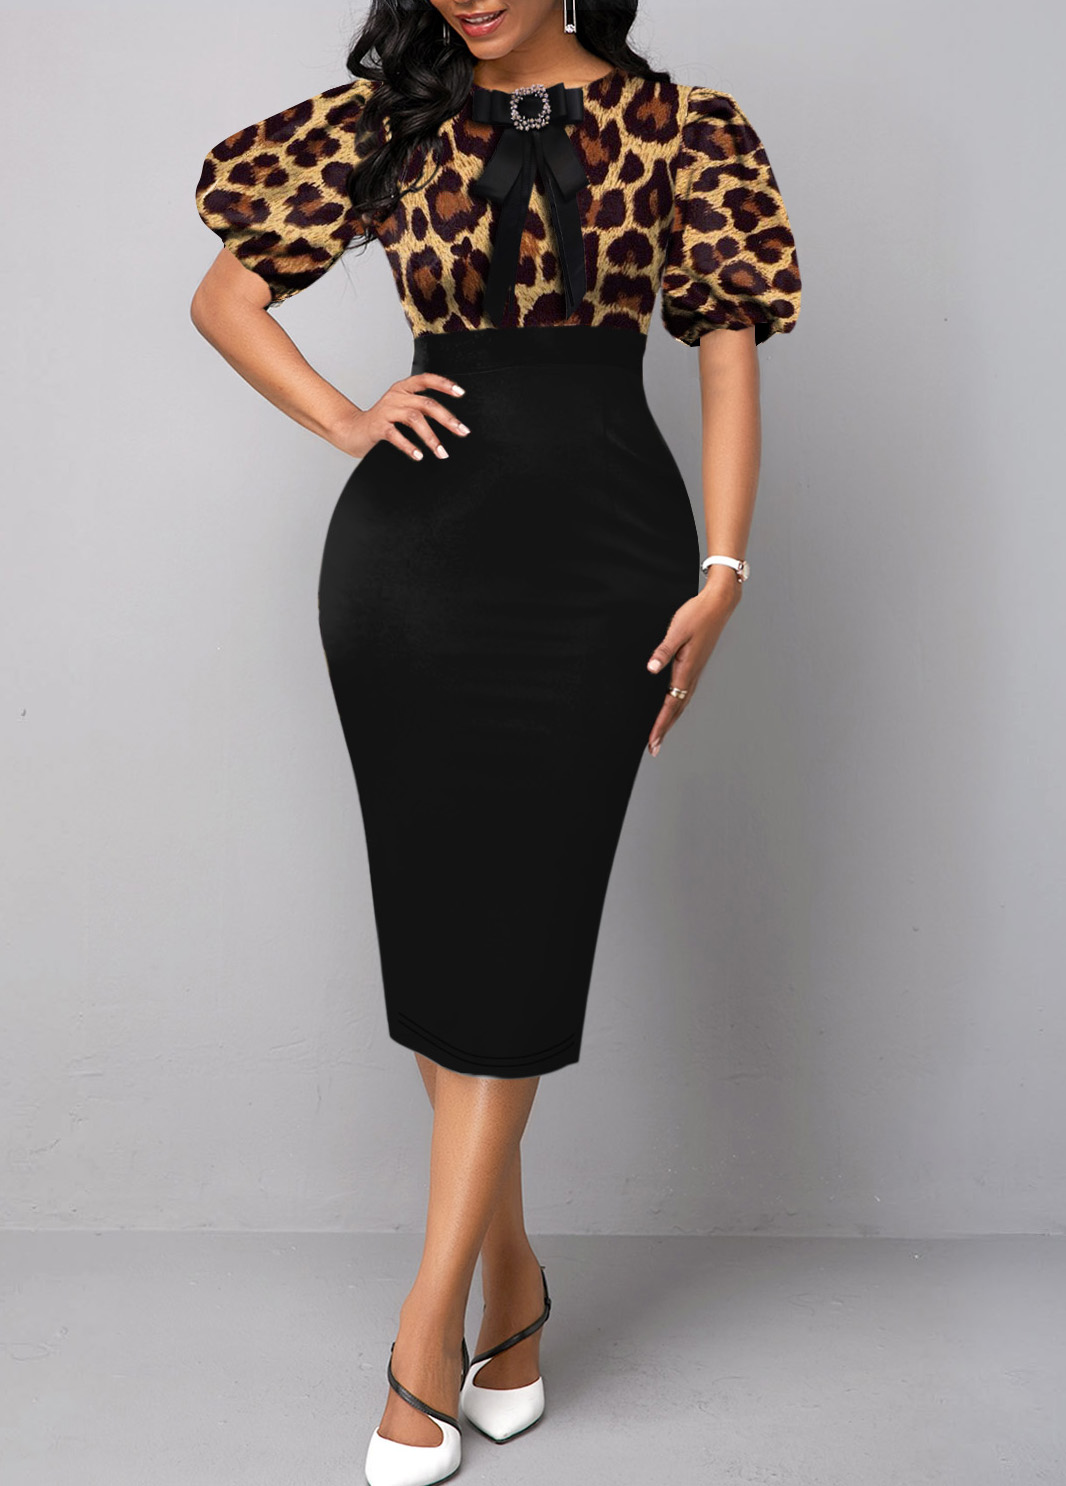 ROTITA Leopard Puff Sleeve Bowknot Bodycon Dress